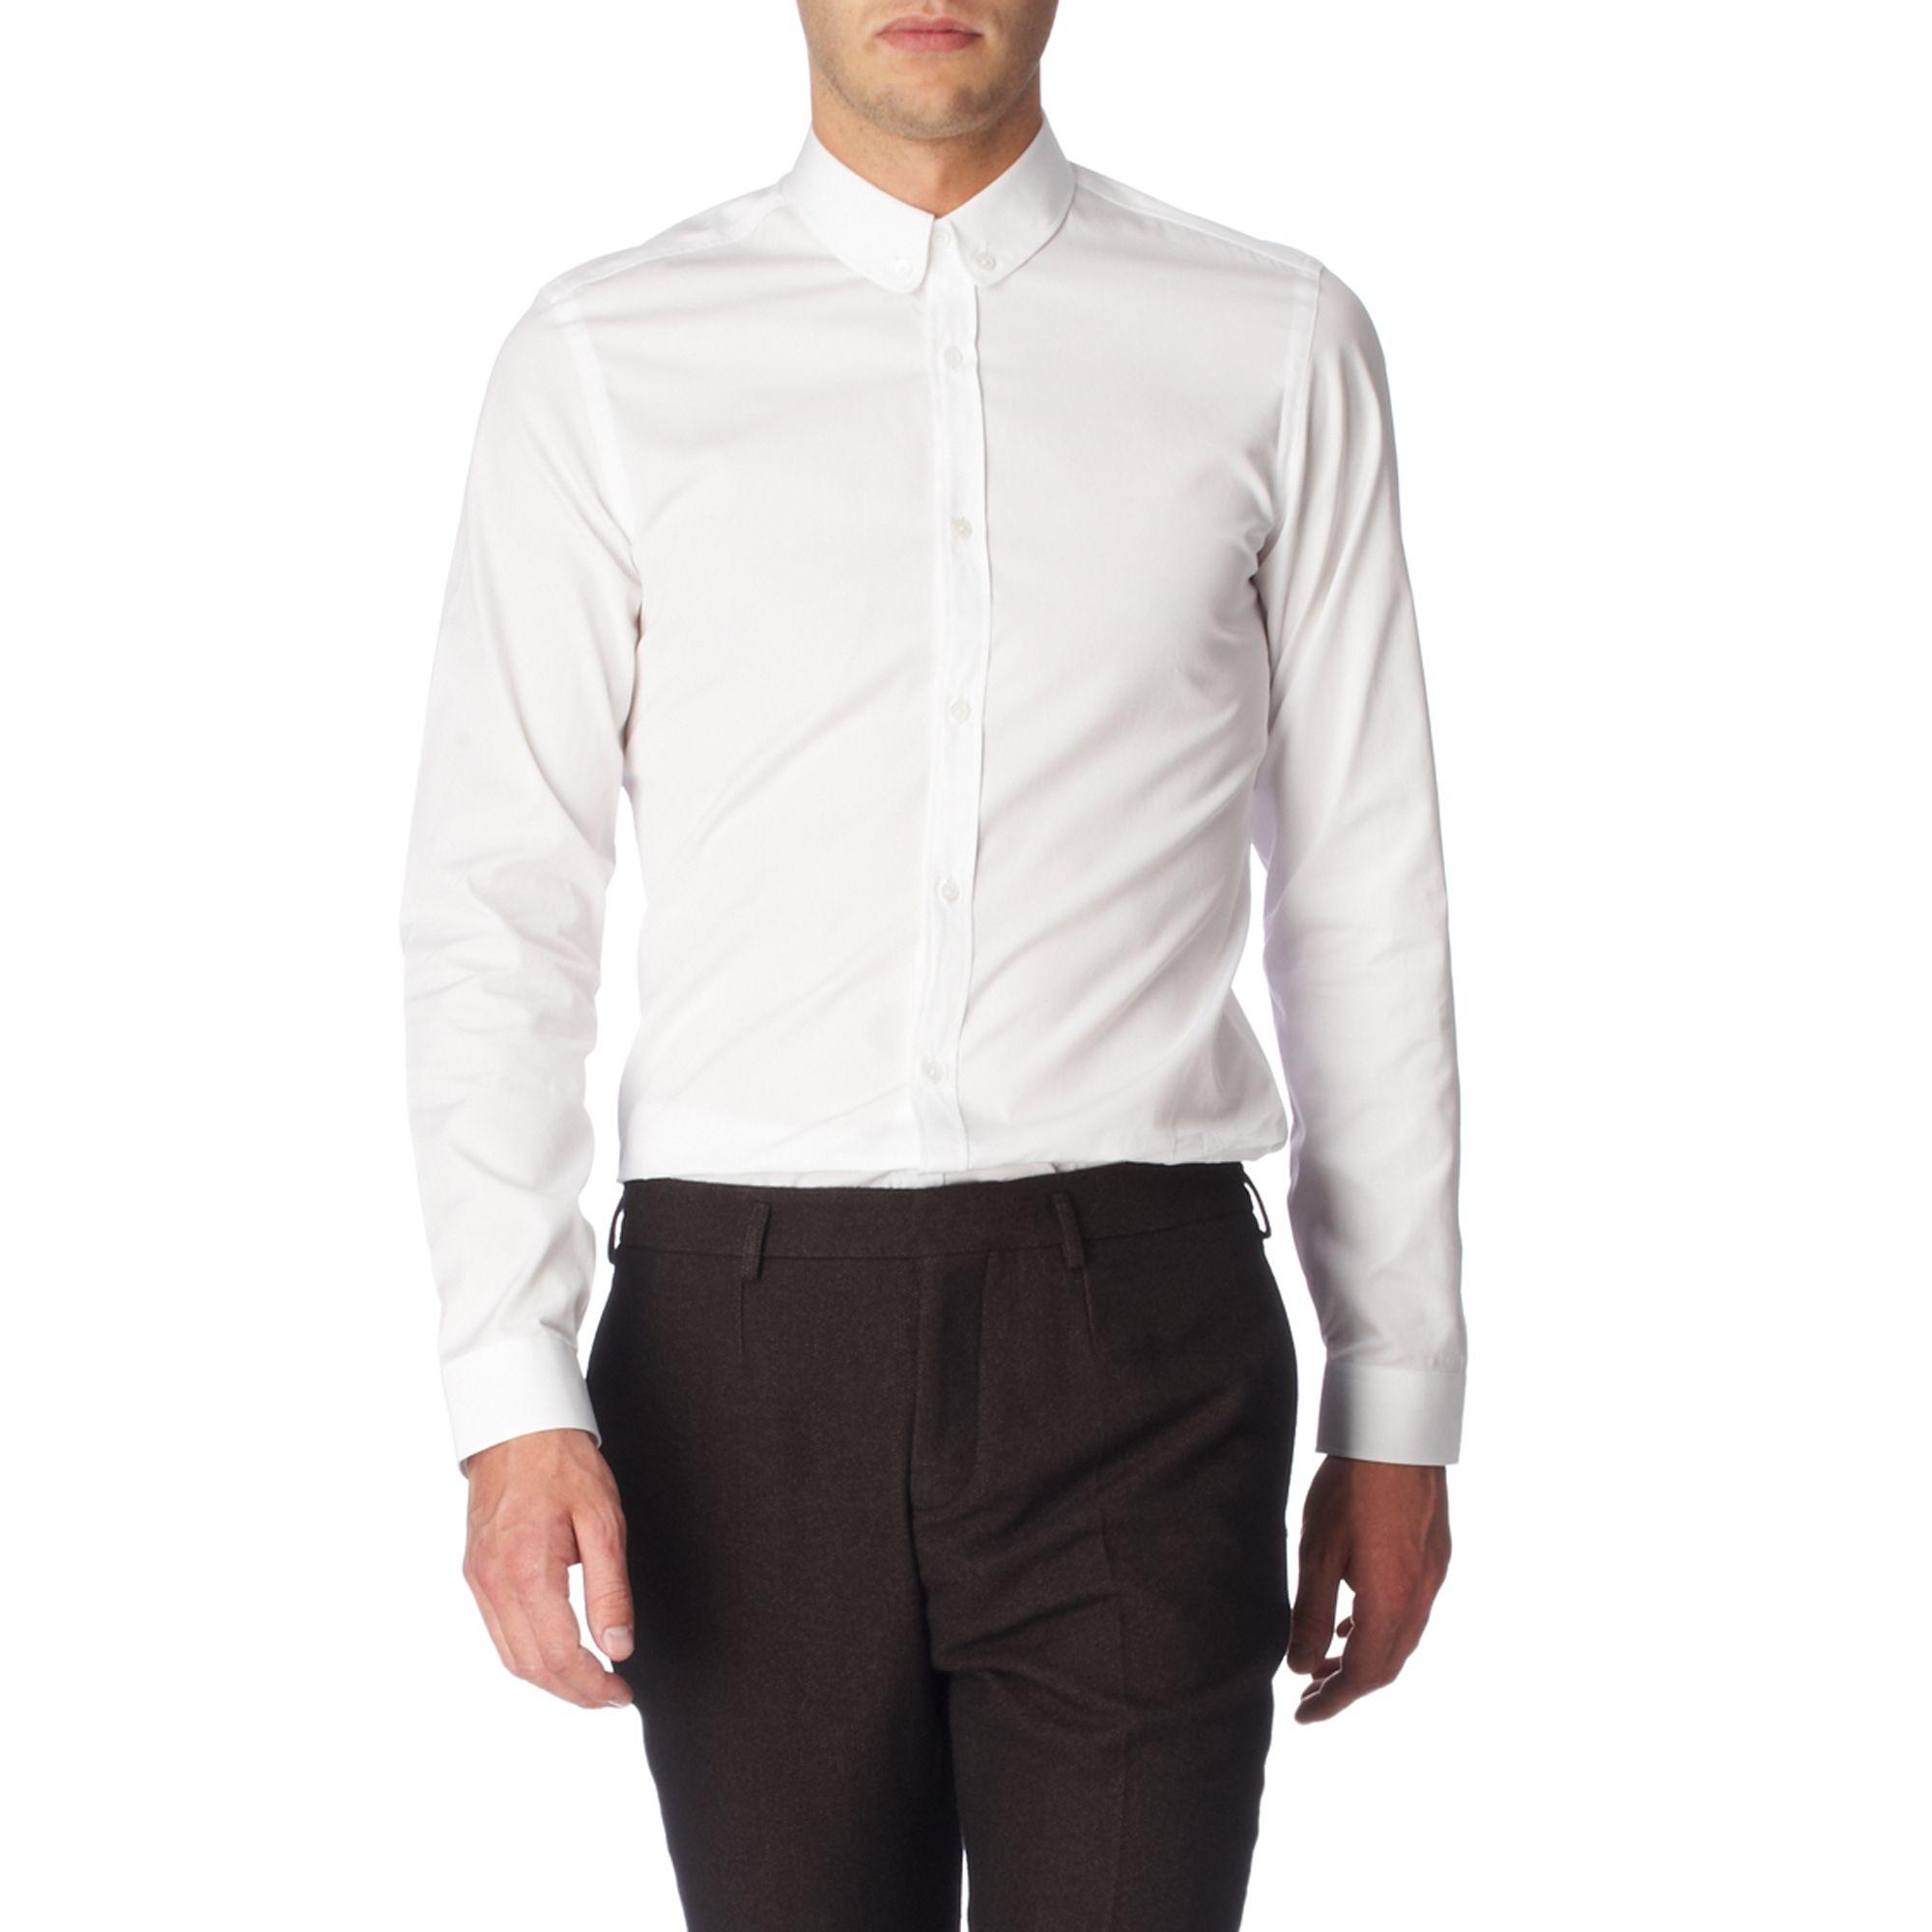 Burberry prorsum plain slim fit single cuff shirt white in for Single cuff dress shirt